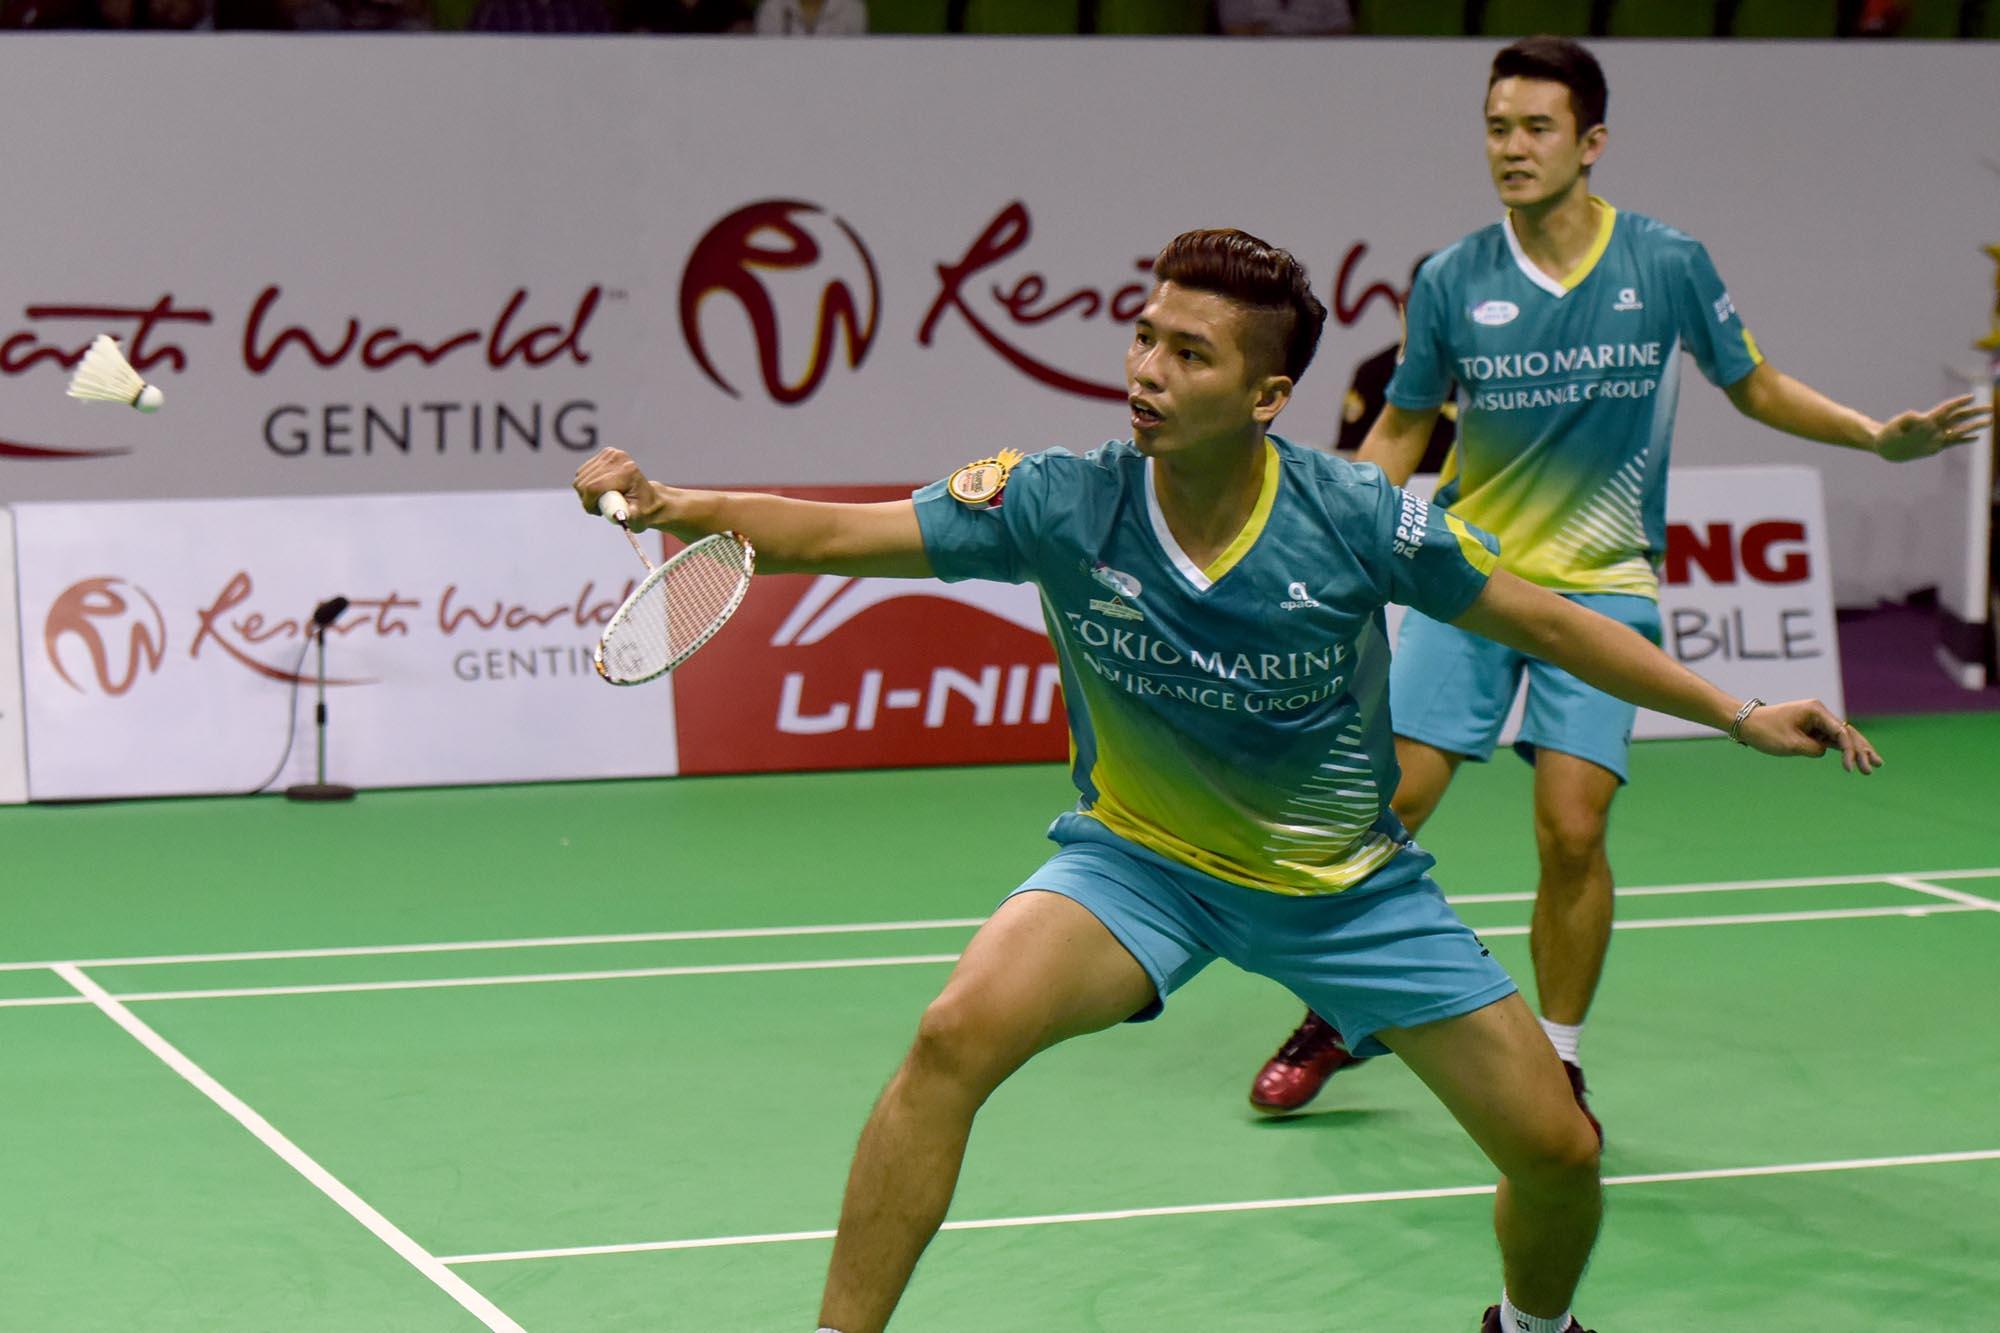 Resorts World Genting Champions Challenge - Muar City Badminton Club - Mens Double - Chow Pak Chuu & Tan Bin Shen. Photo Credit - www.1titan.com